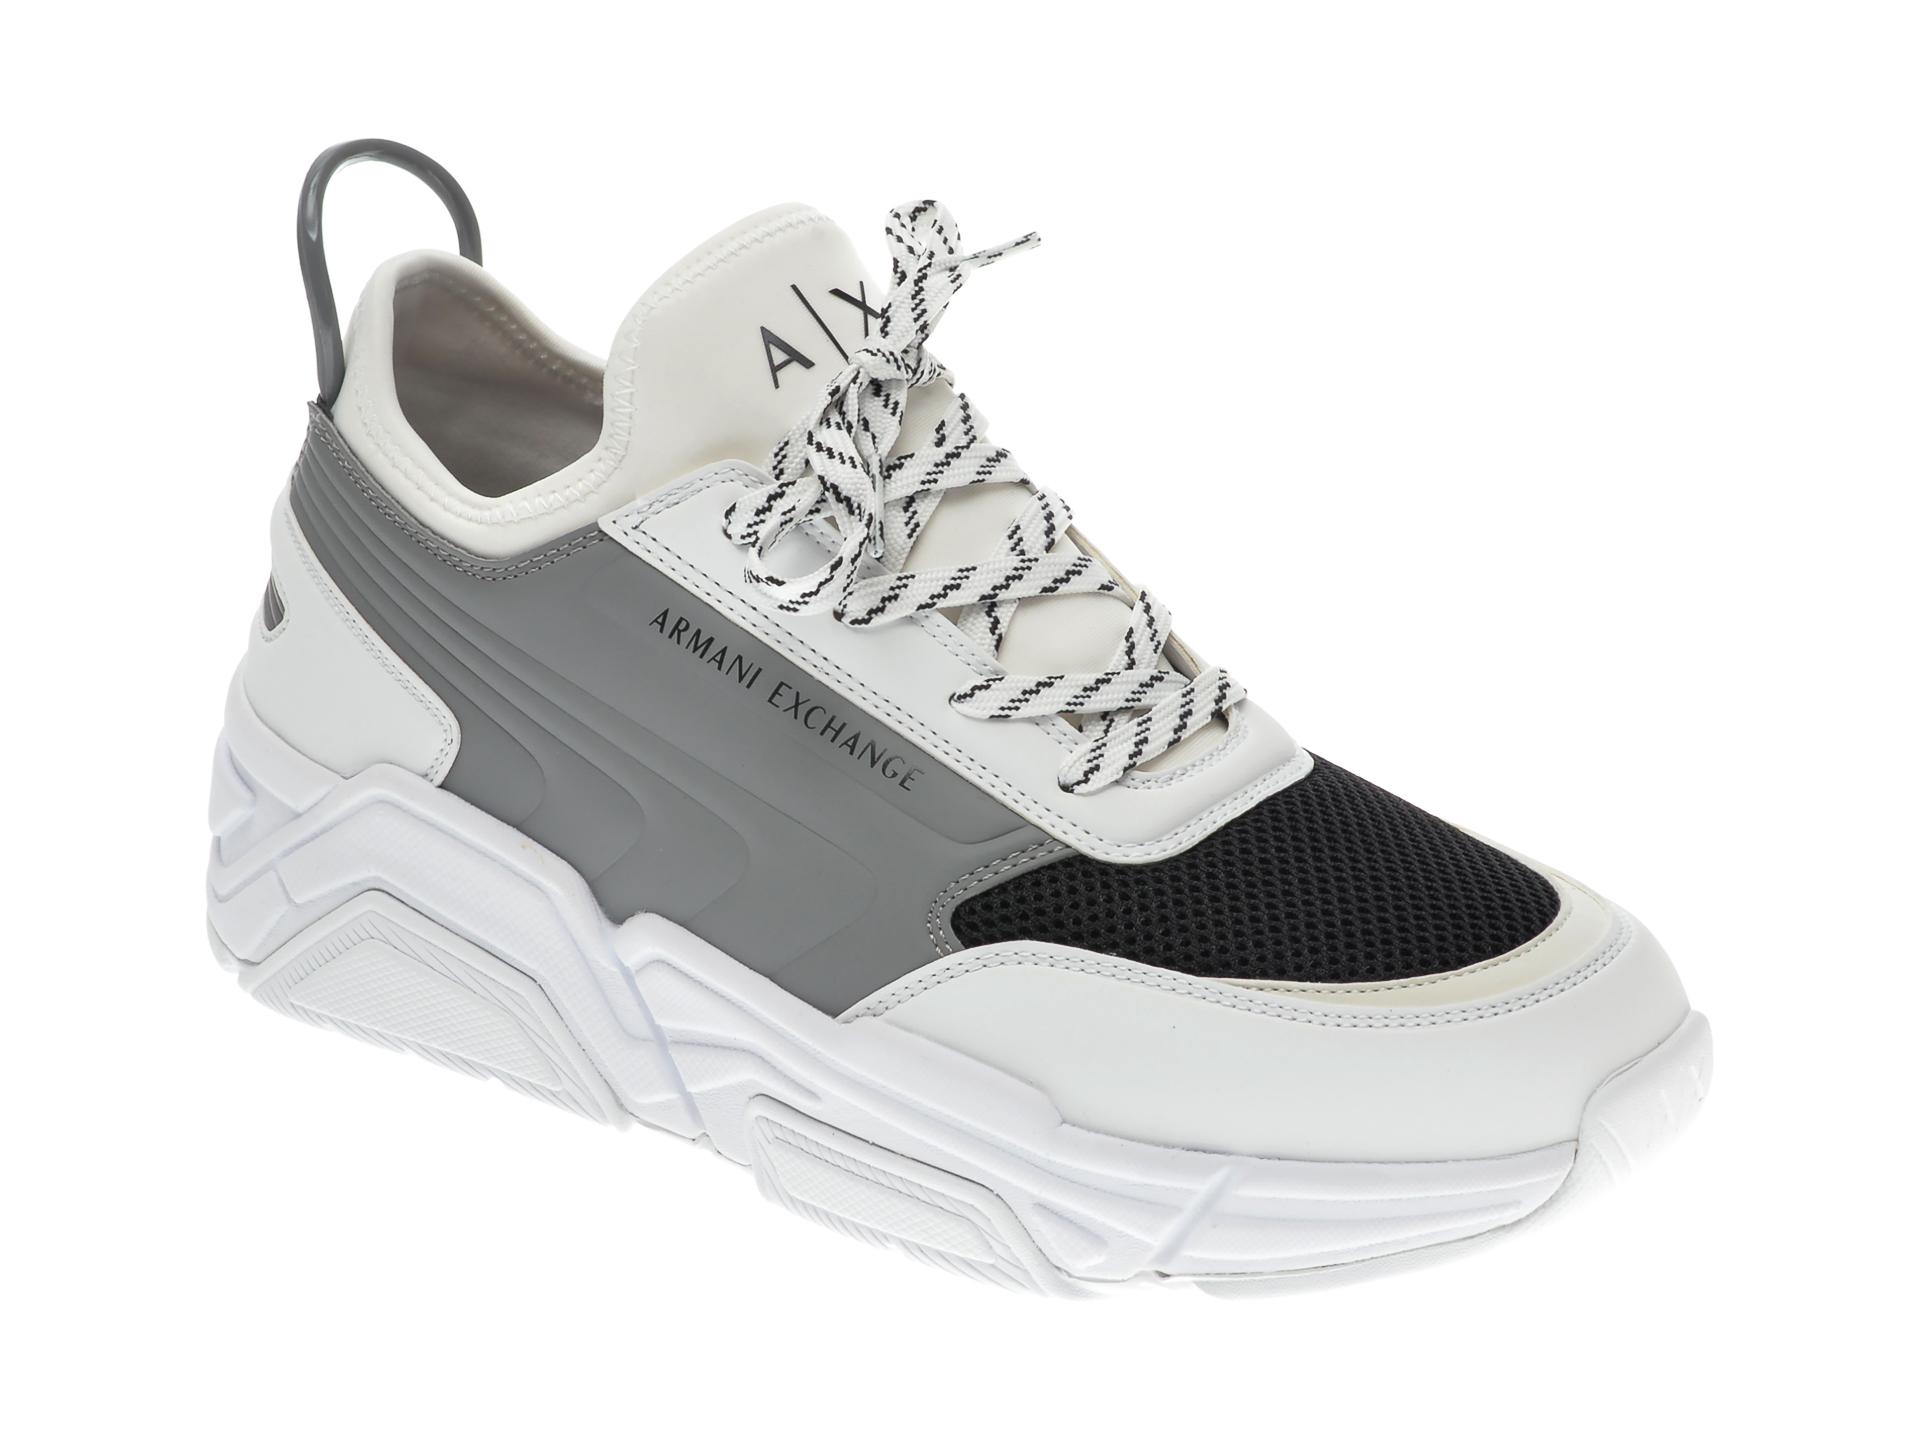 Pantofi sport ARMANI EXCHANGE albi, XUX080, din material textil si piele ecologica imagine